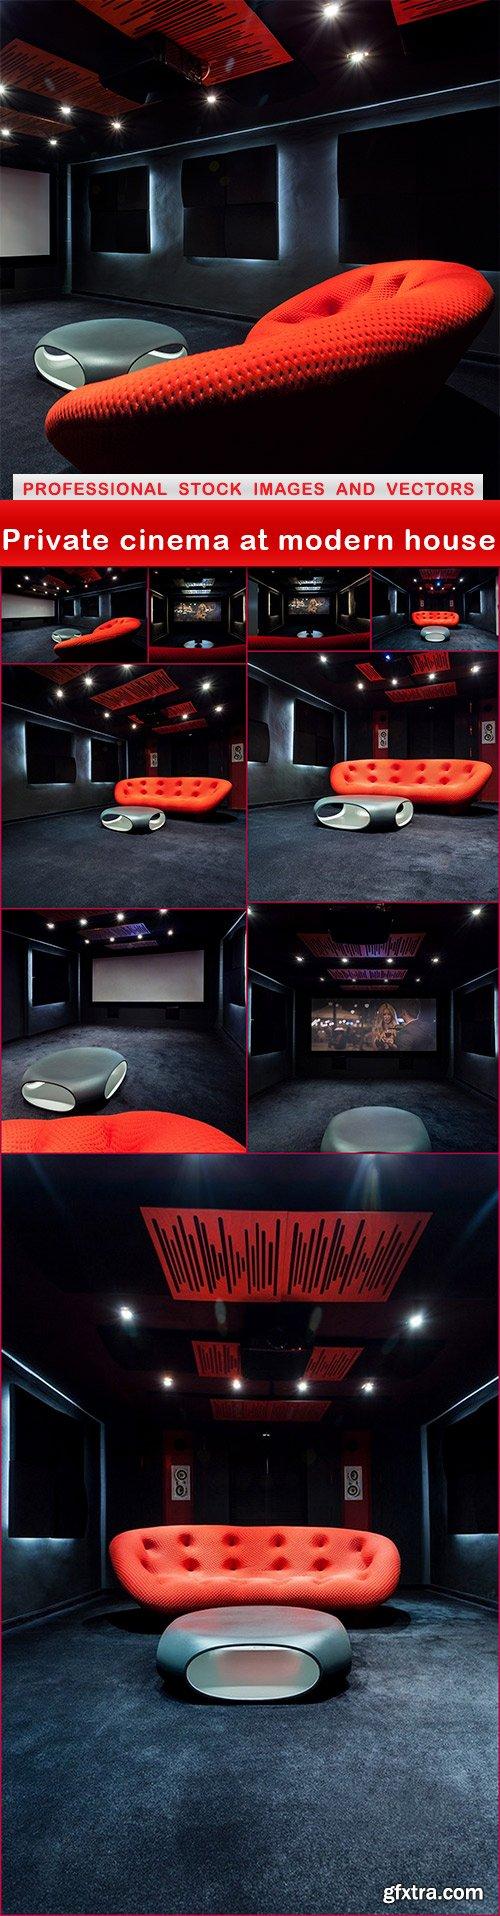 Private cinema at modern house - 10 UHQ JPEG